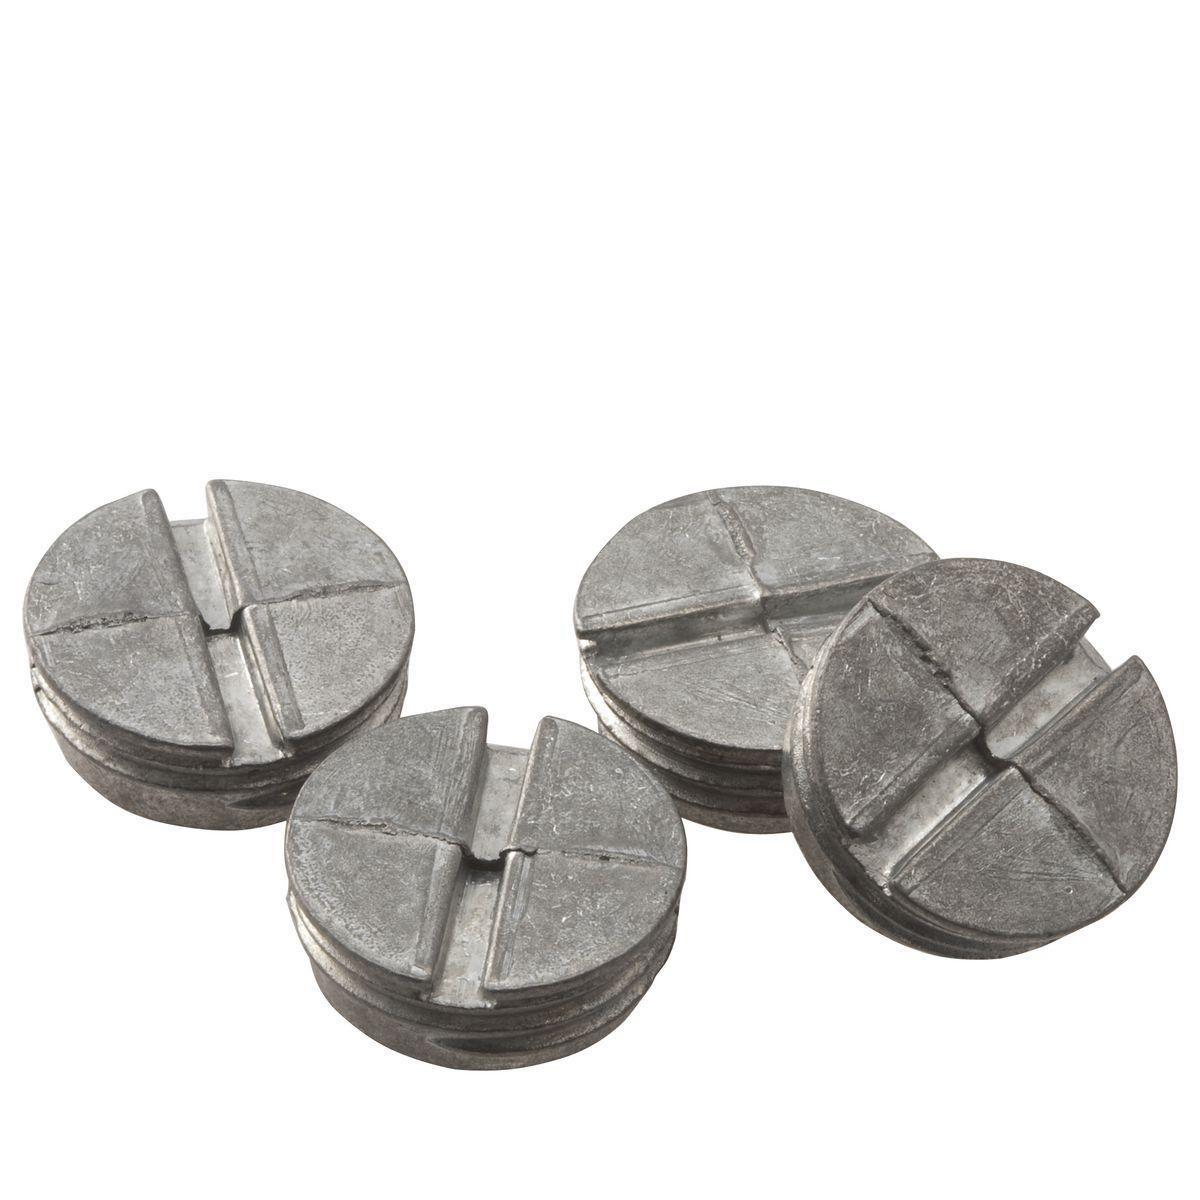 BELL,5269-0,WP CLOSURE PLUG 1/2 IN. NPT GRAY (4/BAG)